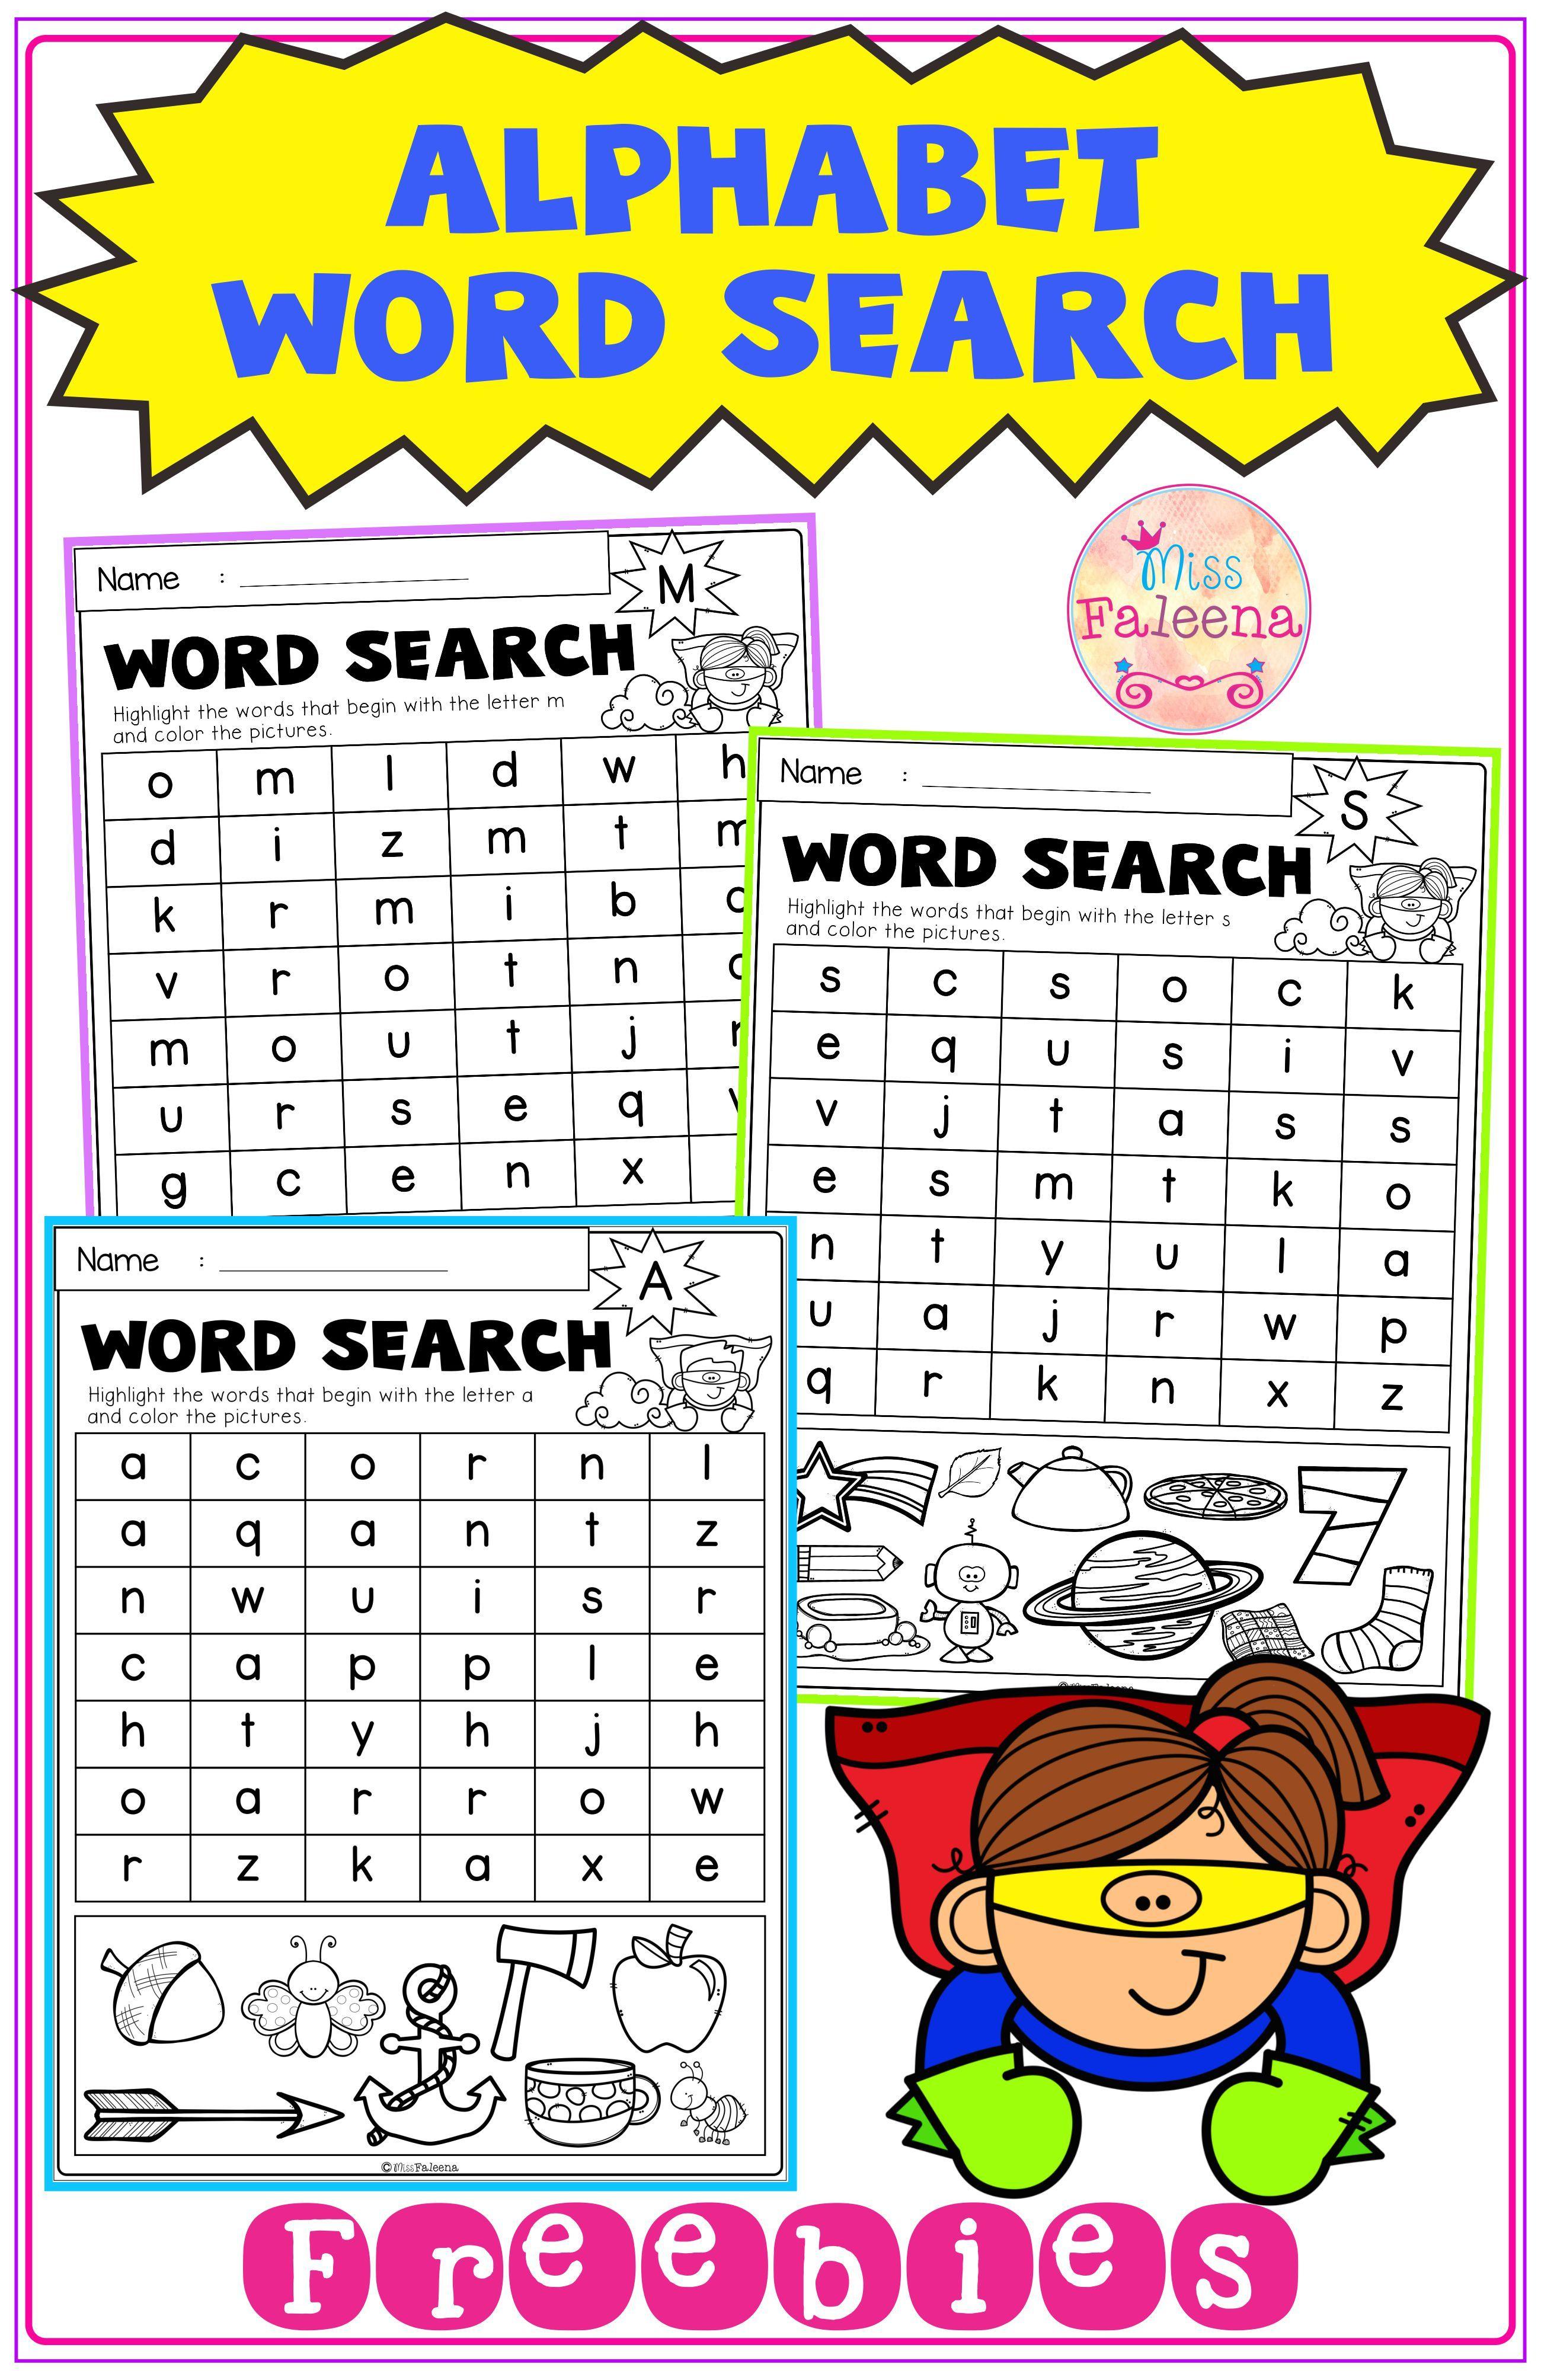 Free Alphabet Word Search